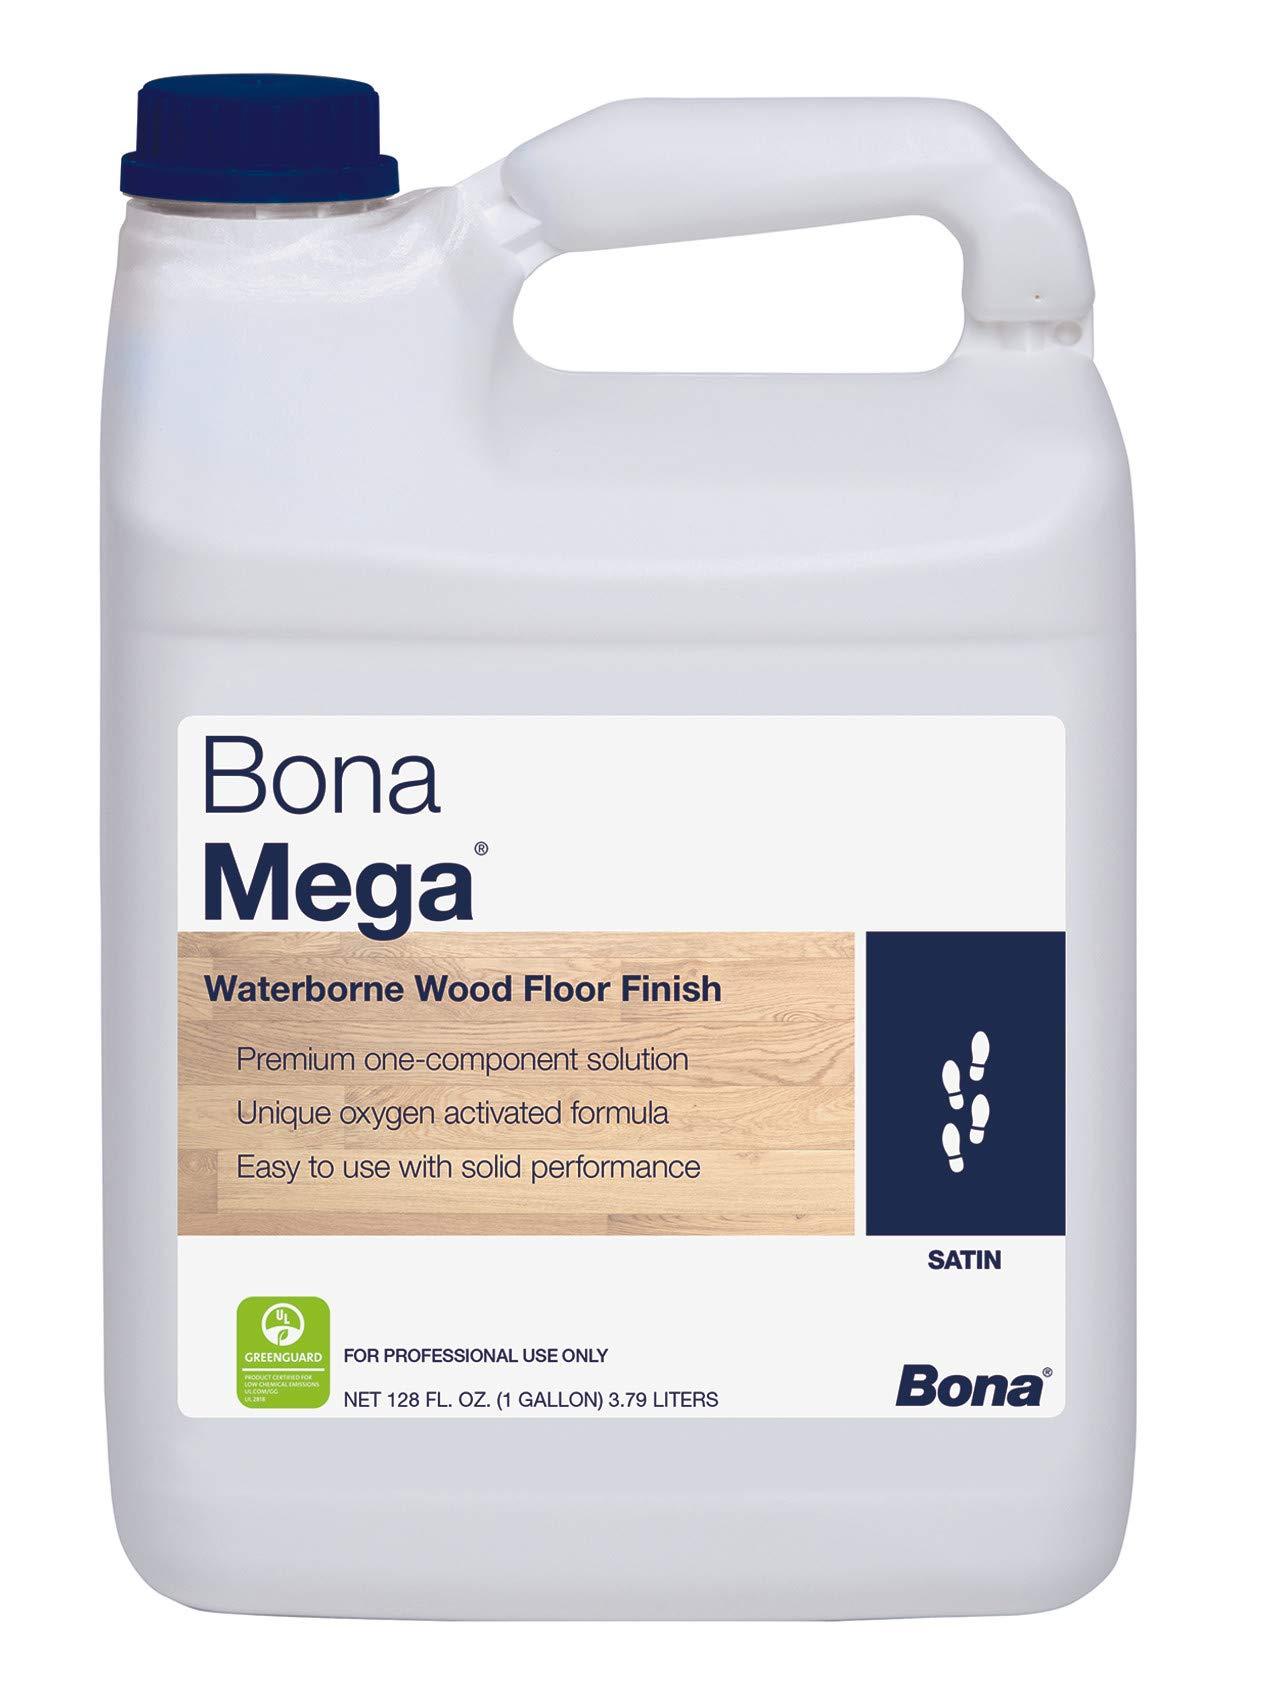 Bona Shop Uae Buy Bona Products Online In Dubai Whizz Ae